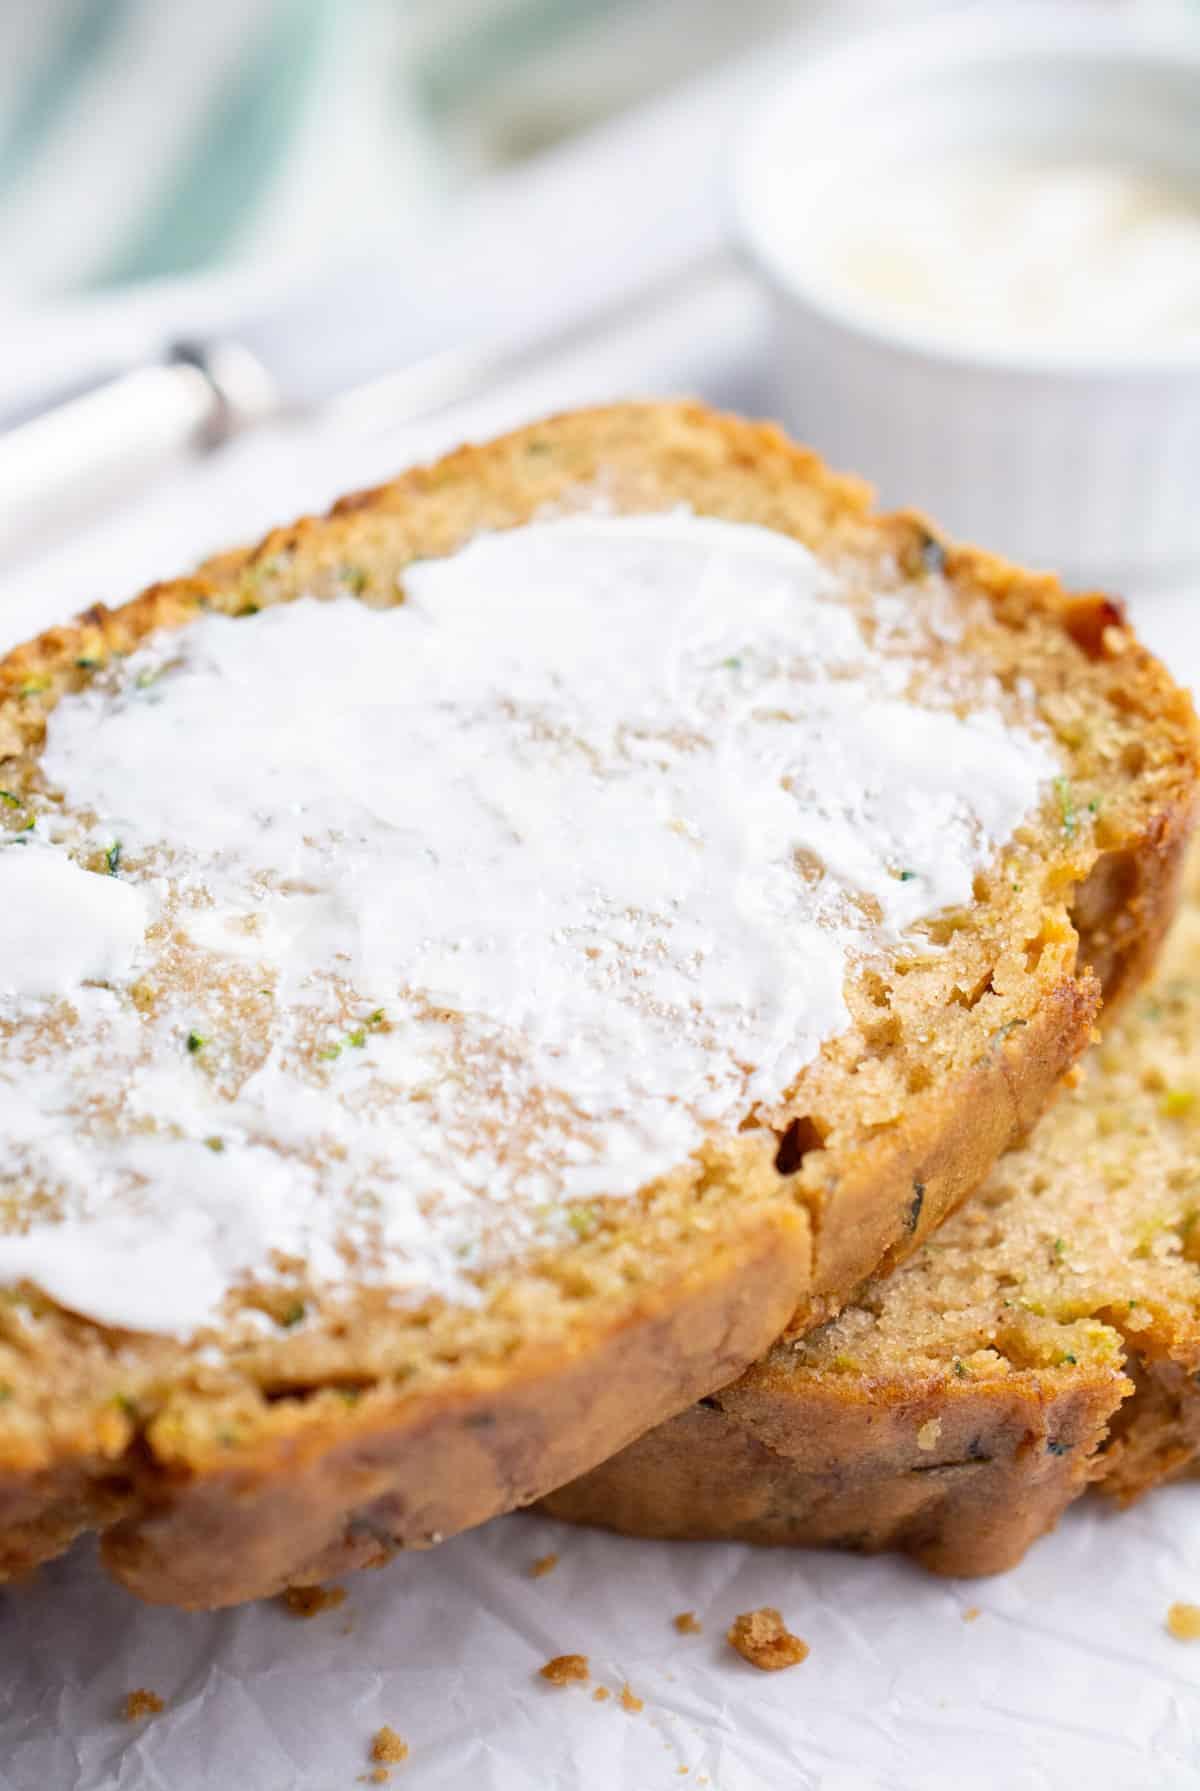 A buttered slice of vegan zucchini bread.